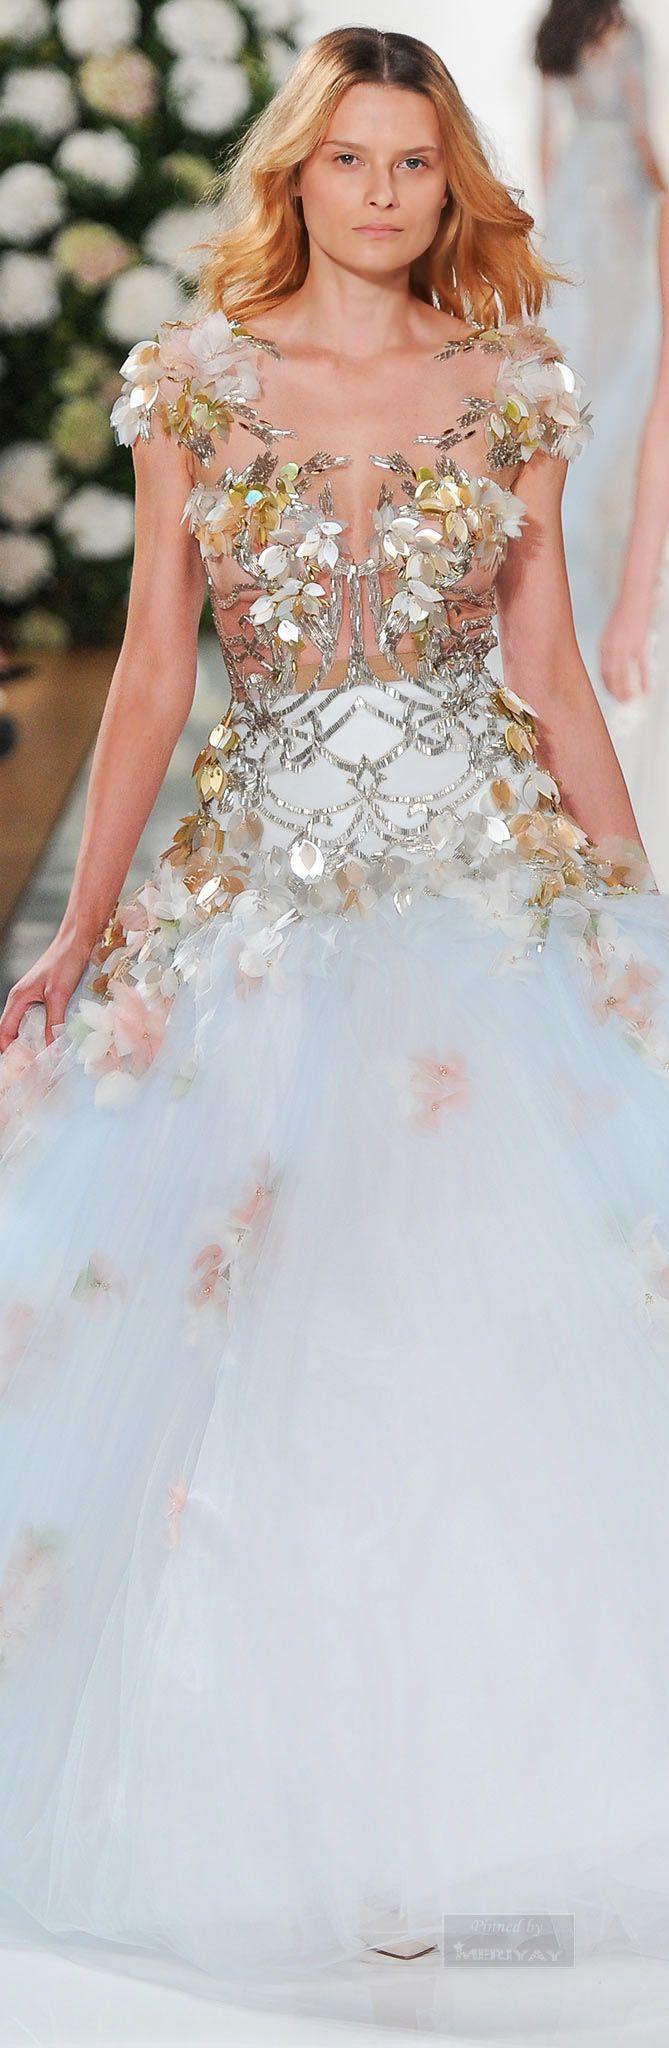 best fashion pashion images on pinterest